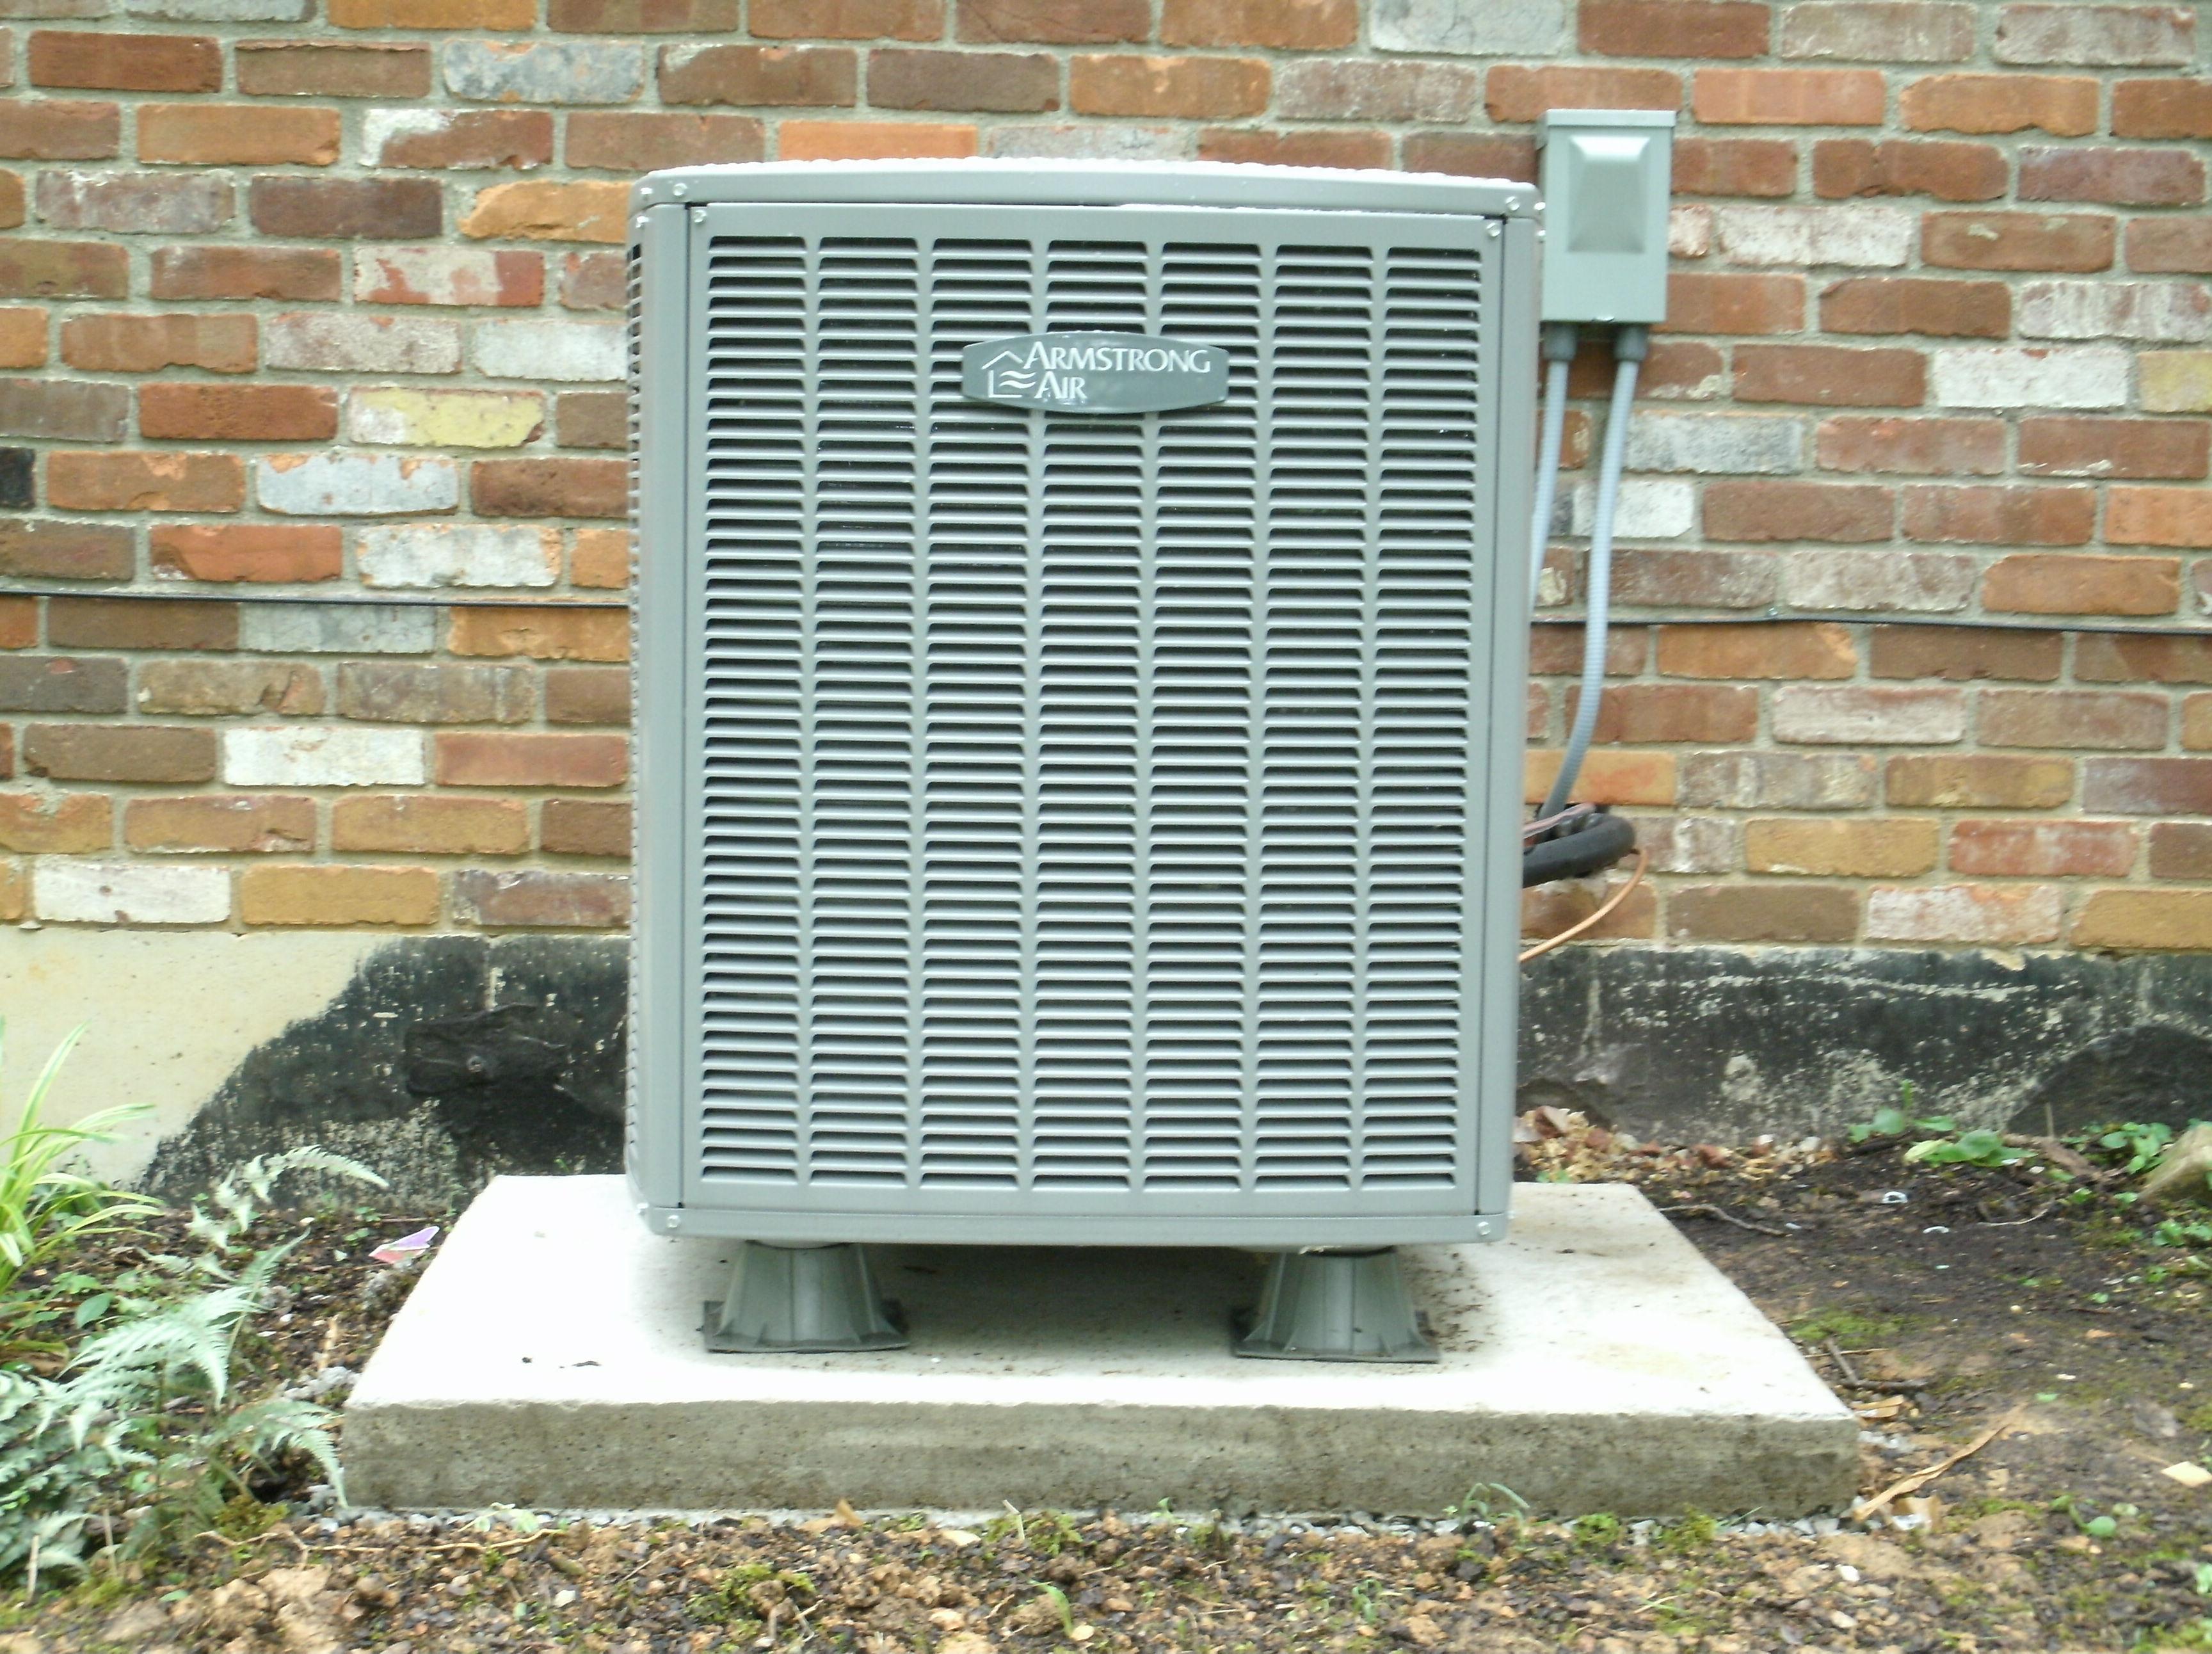 14 Seer Armstrong Air Heat Pump